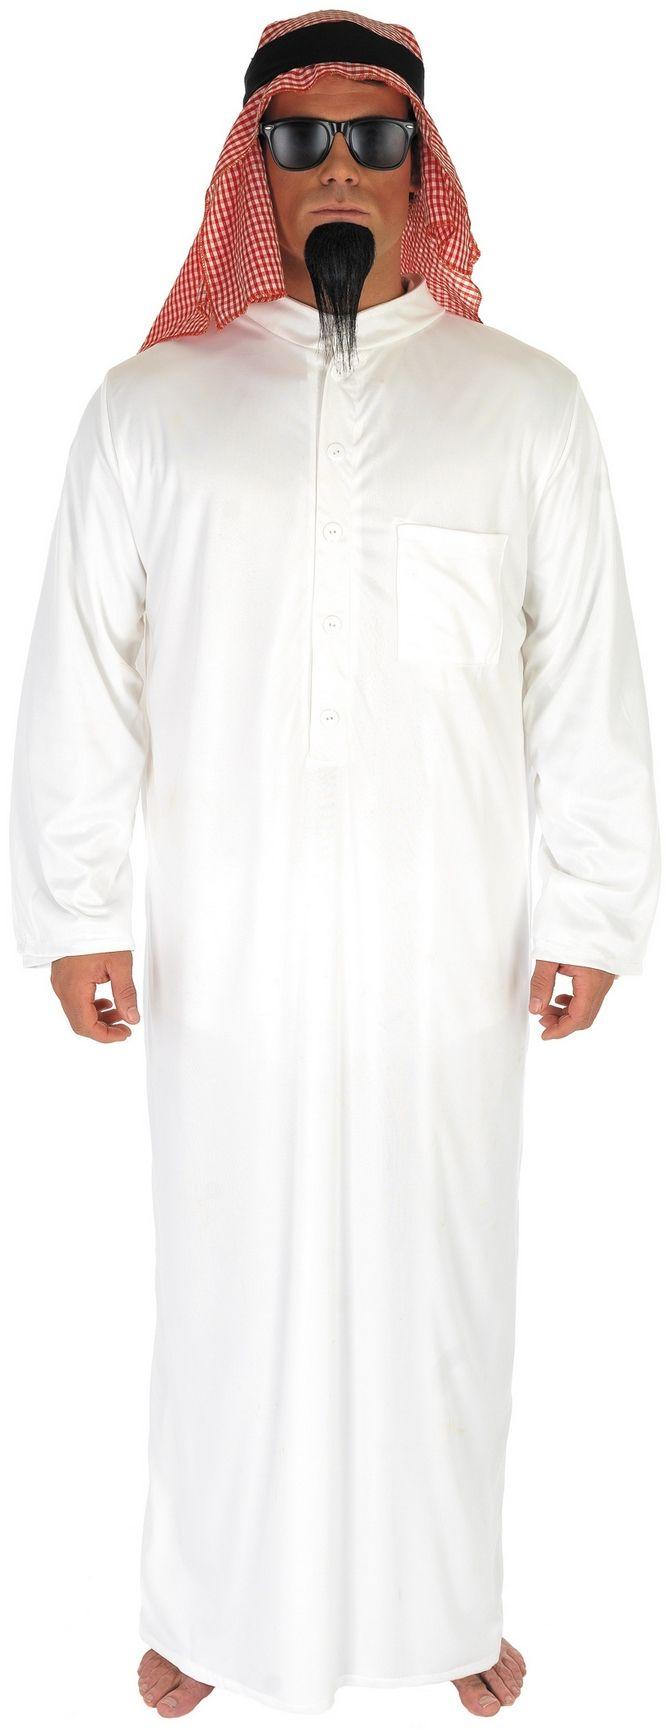 Mens Oil Sheikh Arab Fancy Dress Costume FUN2784 #snowedin #onlineshopping